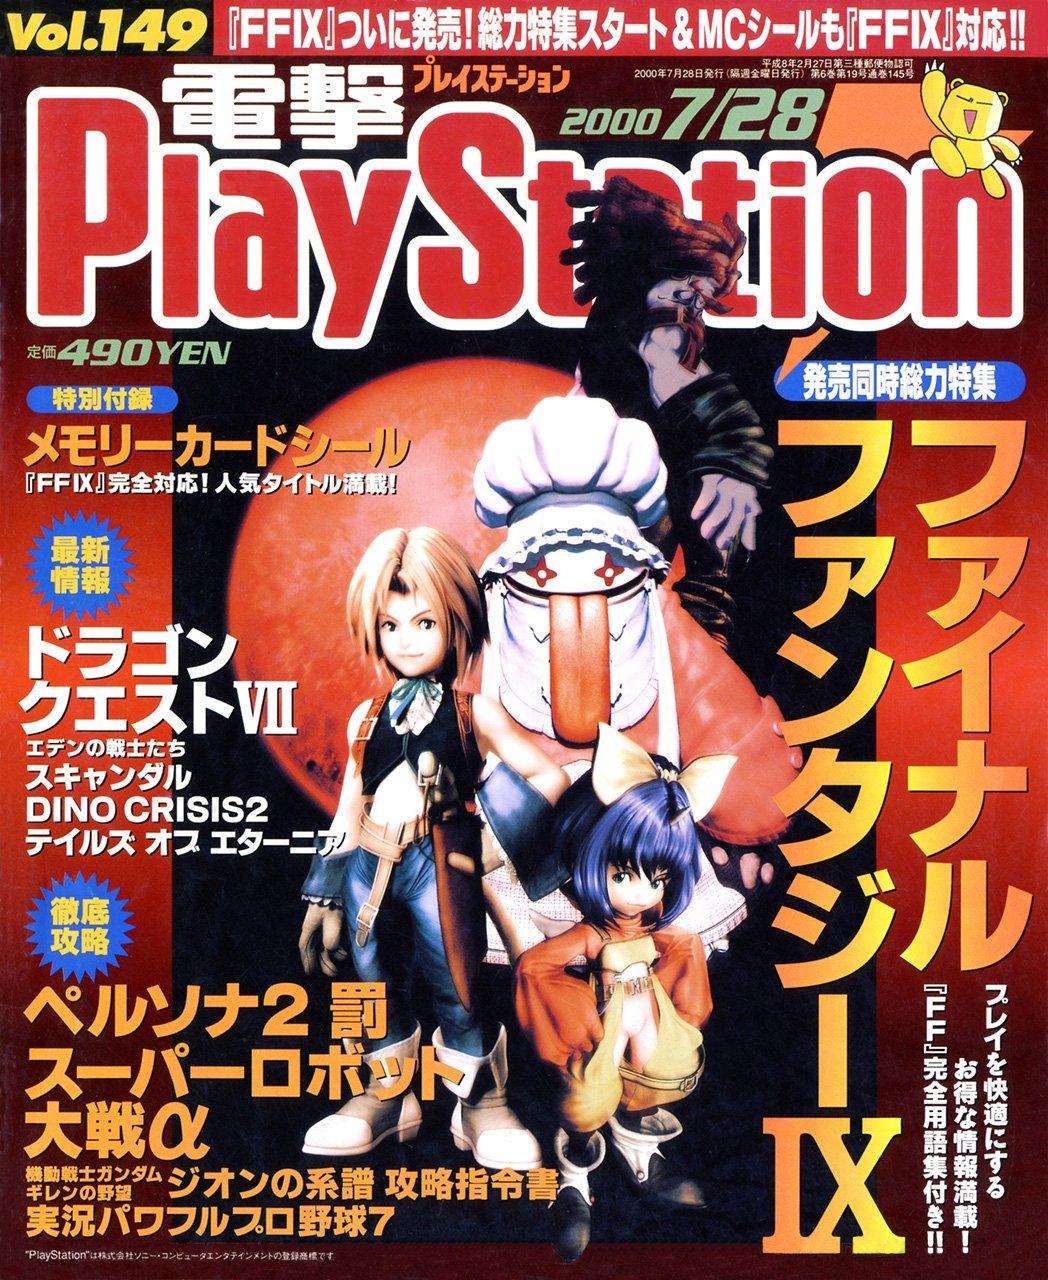 Dengeki PlayStation 149 (July 28, 2000)